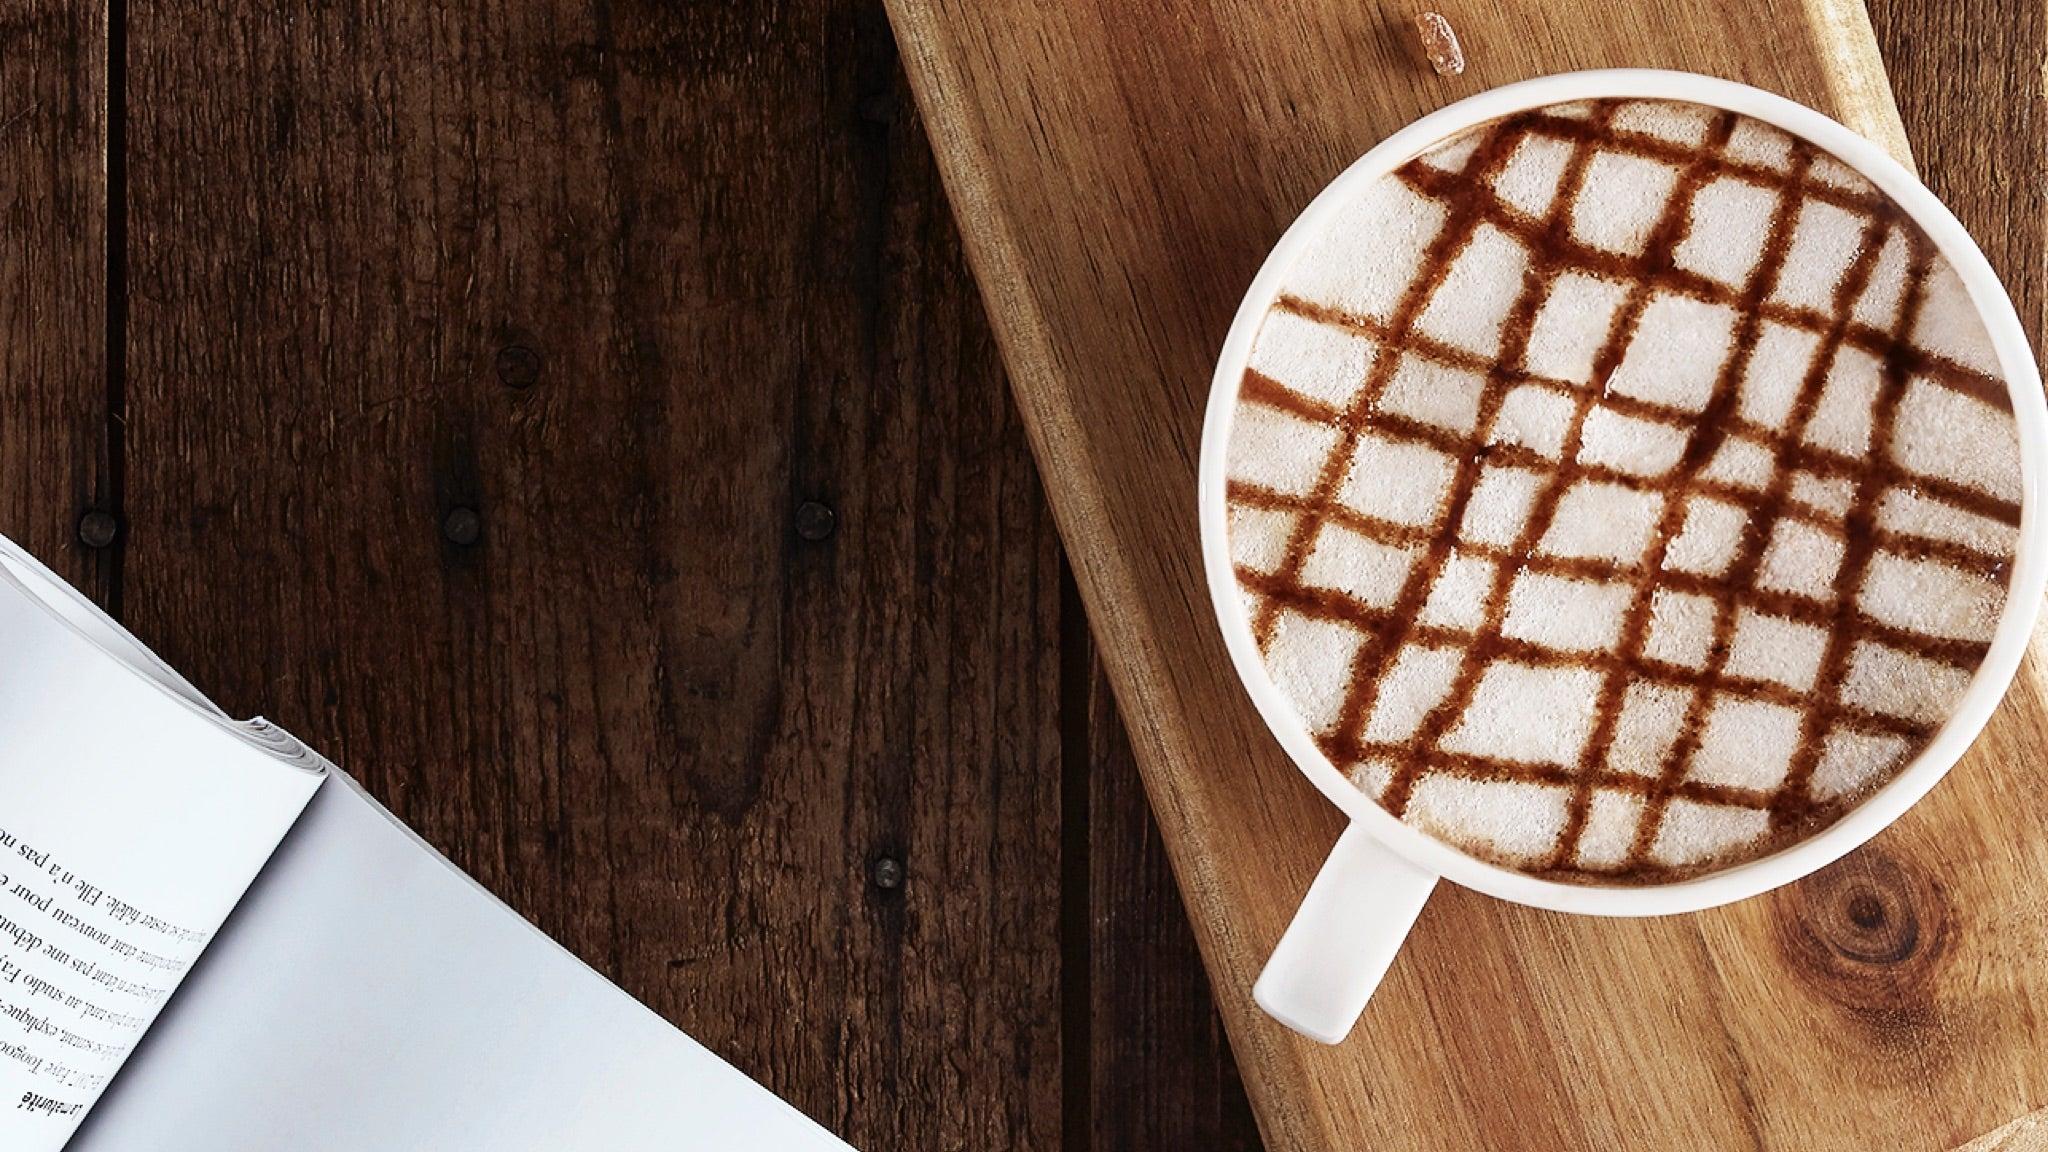 I like my coffee frothy